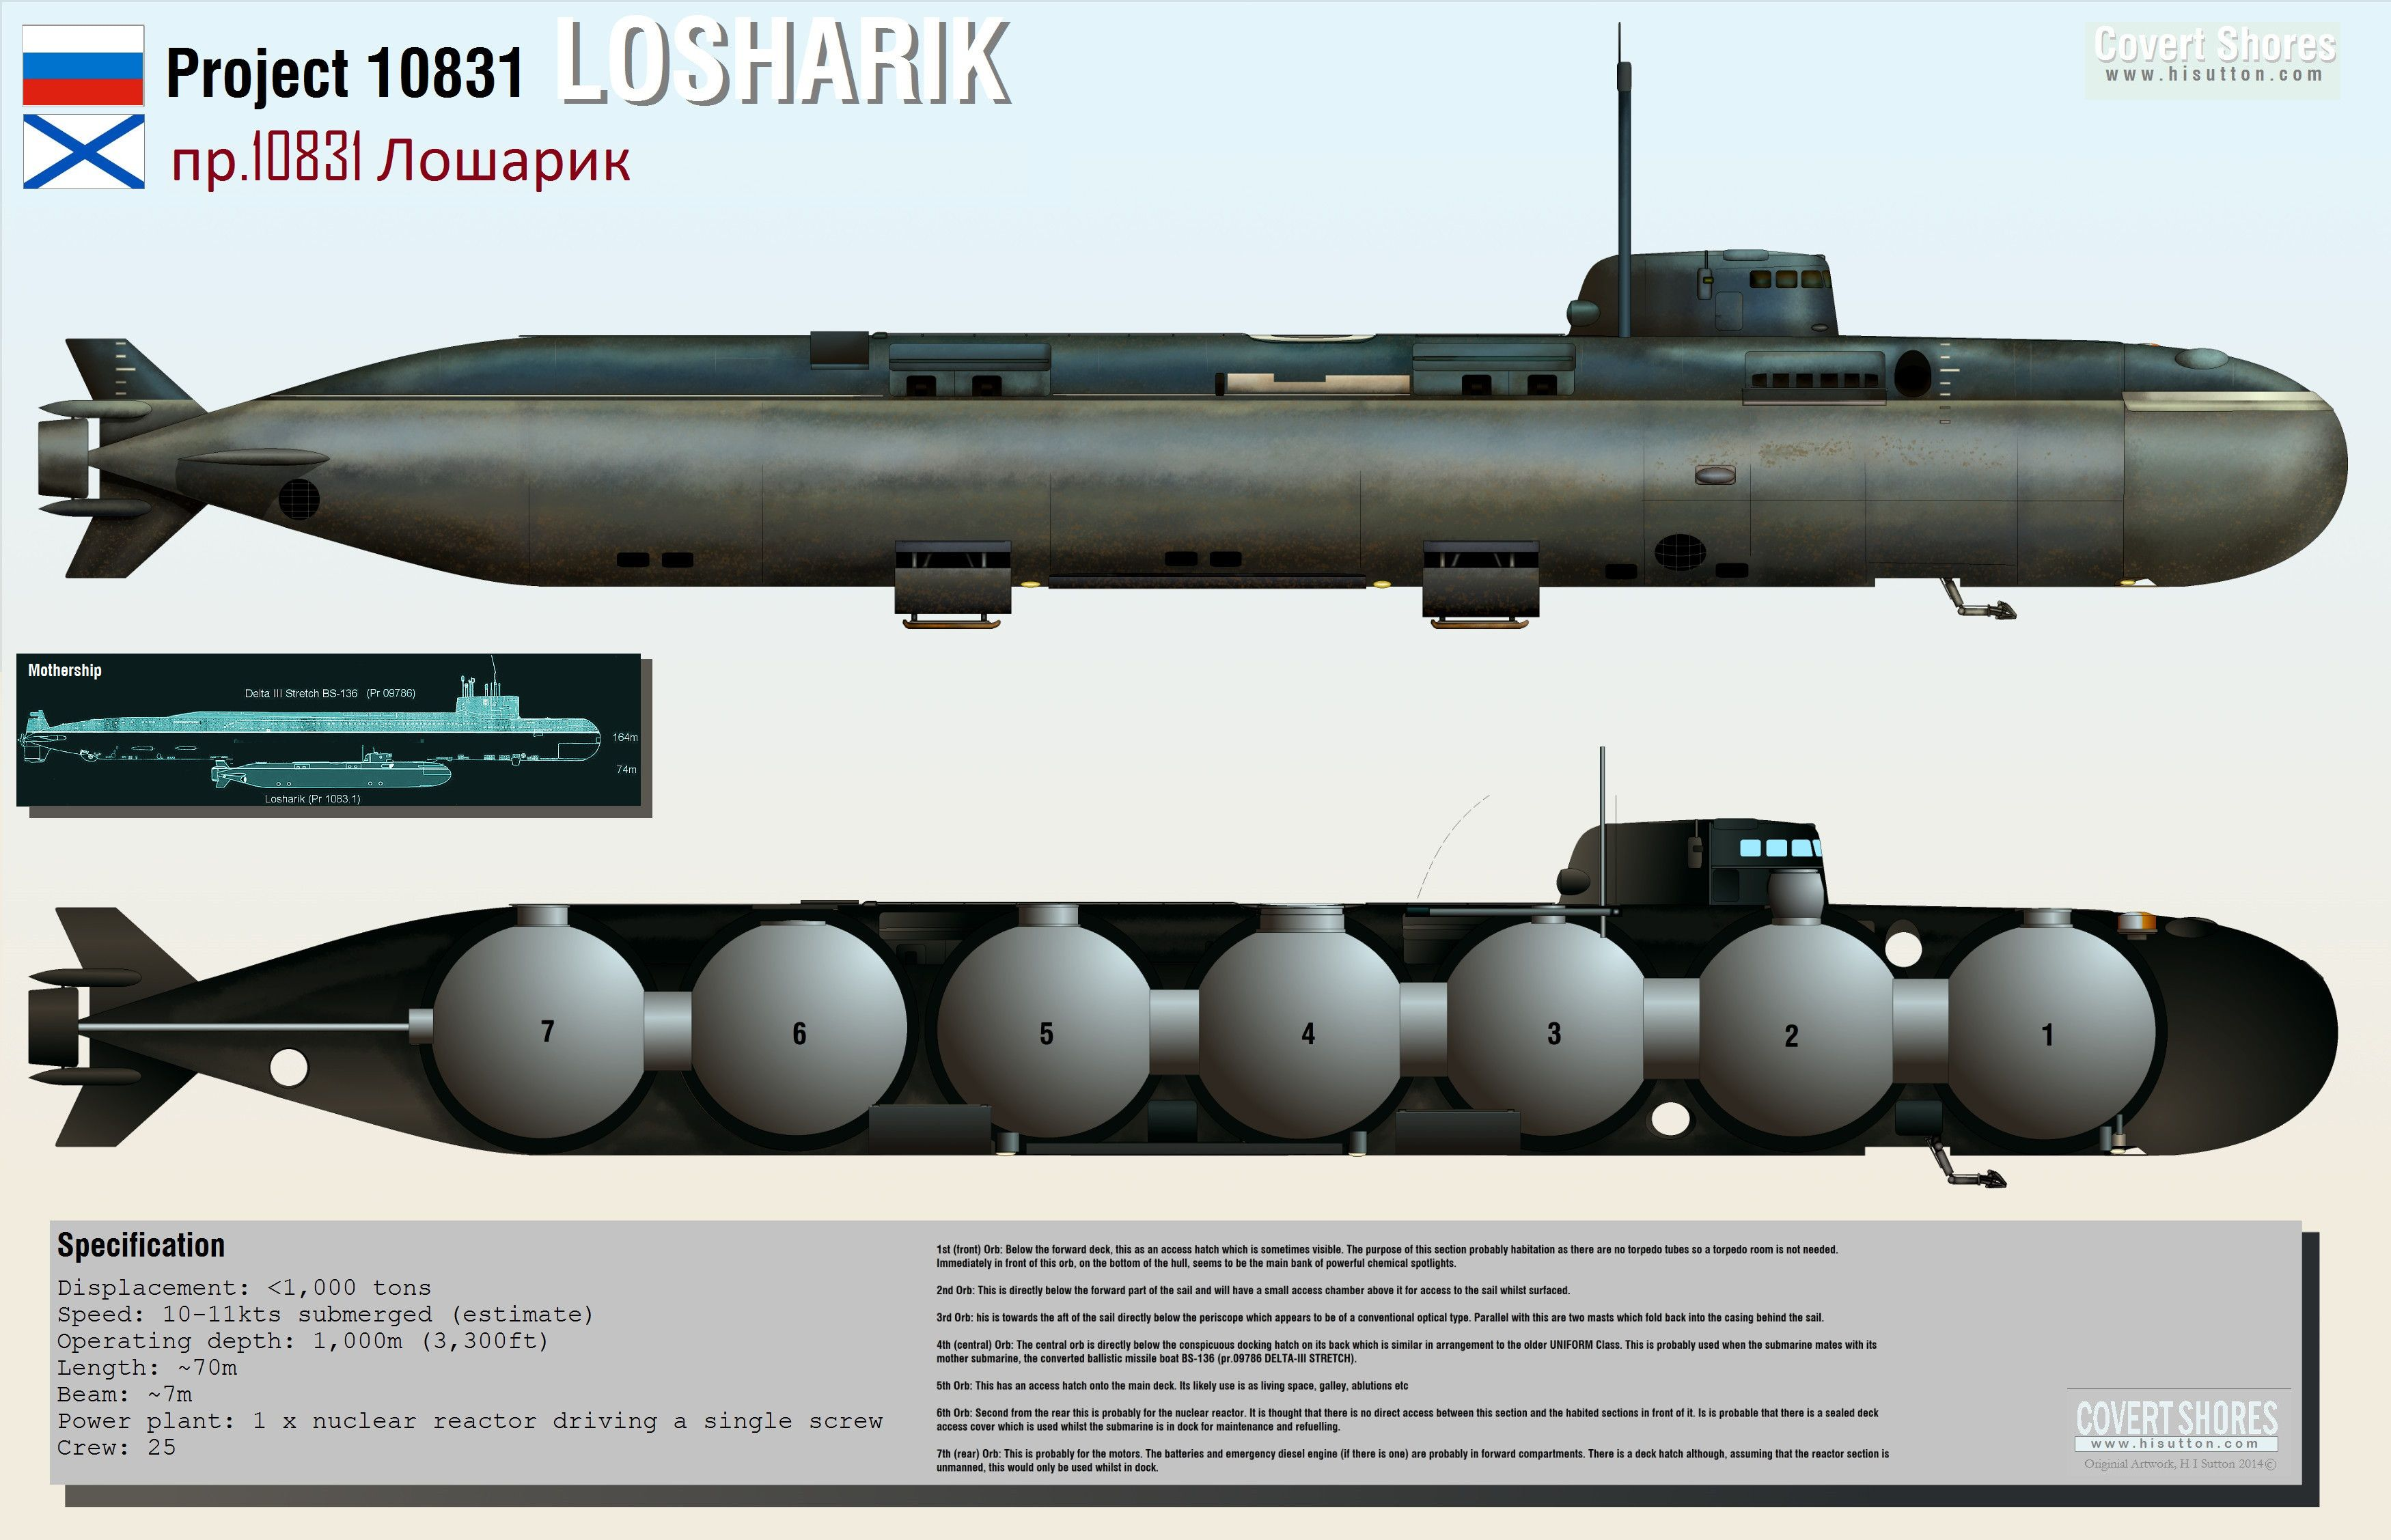 Oc Cutaway Of Russian Losharik Spy Sub See Comments For